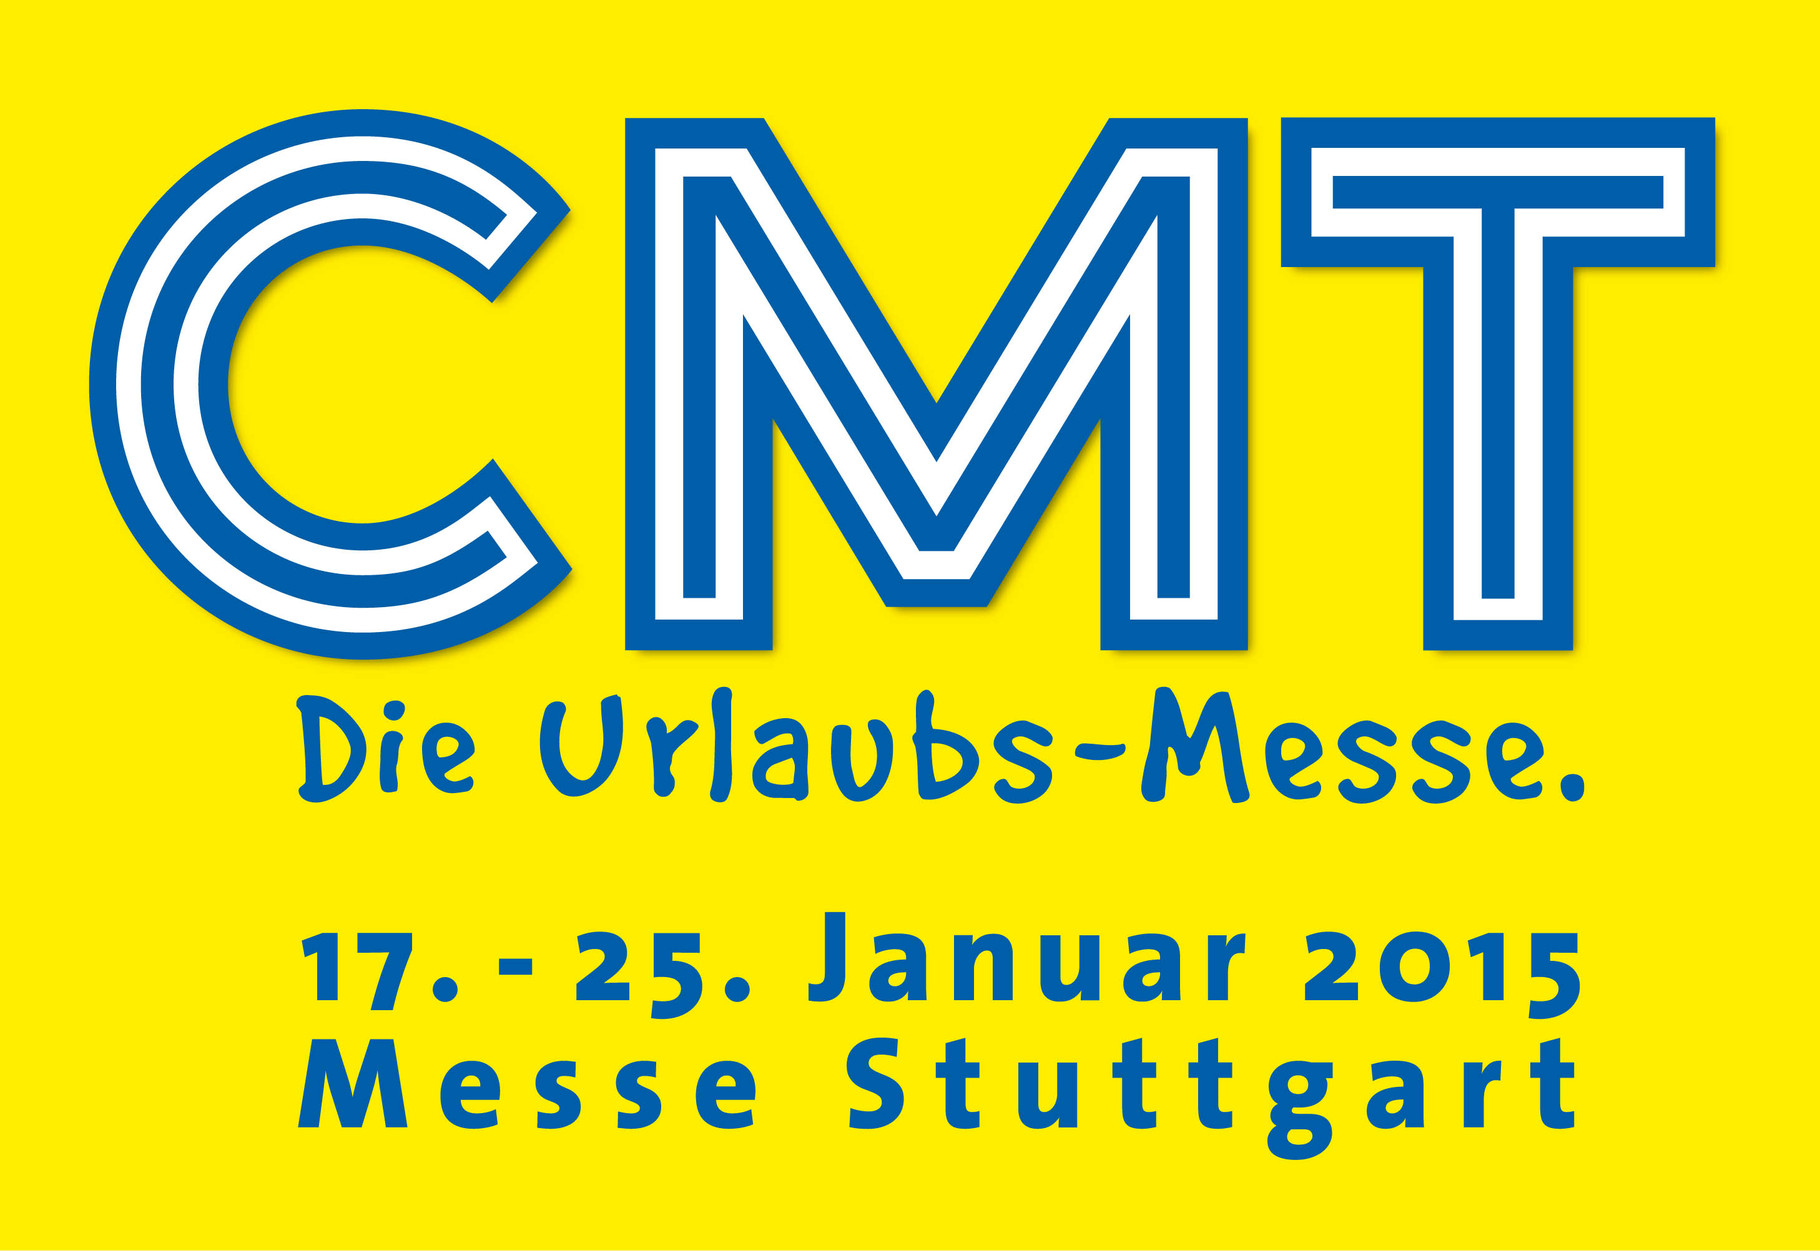 Logo CMT 2015